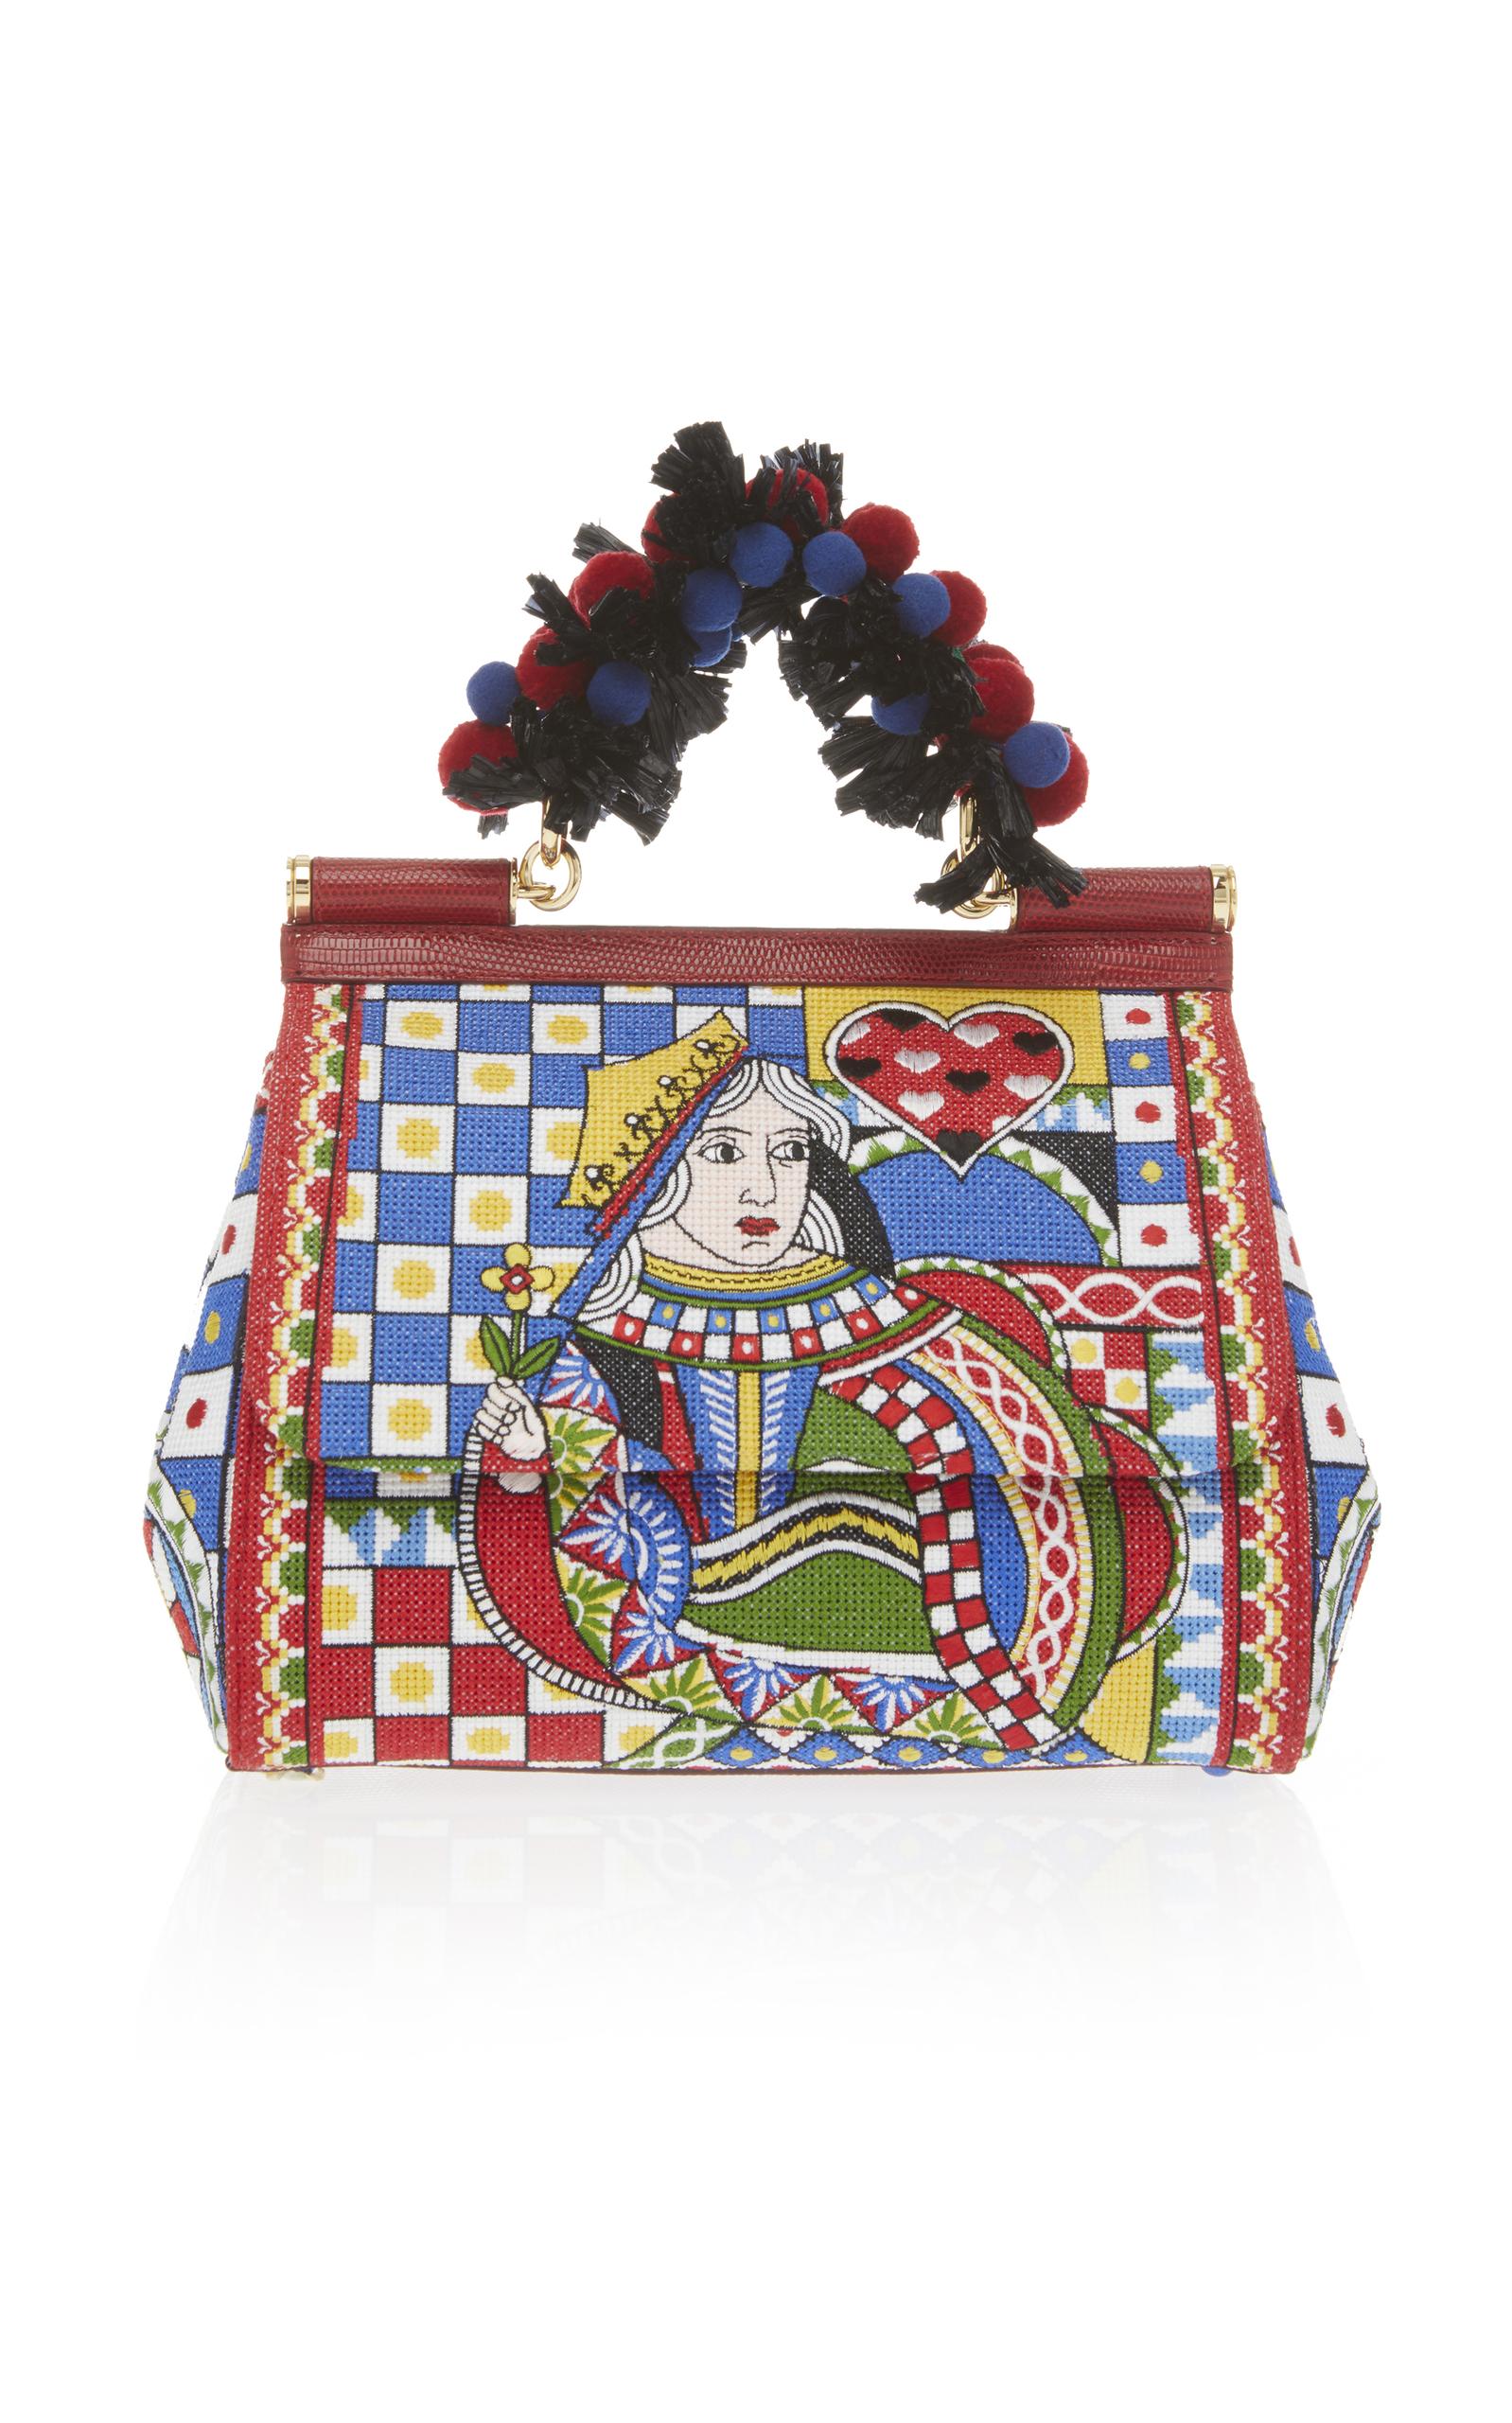 b5bcd604fa Medium Sicily Bag by Dolce   Gabbana